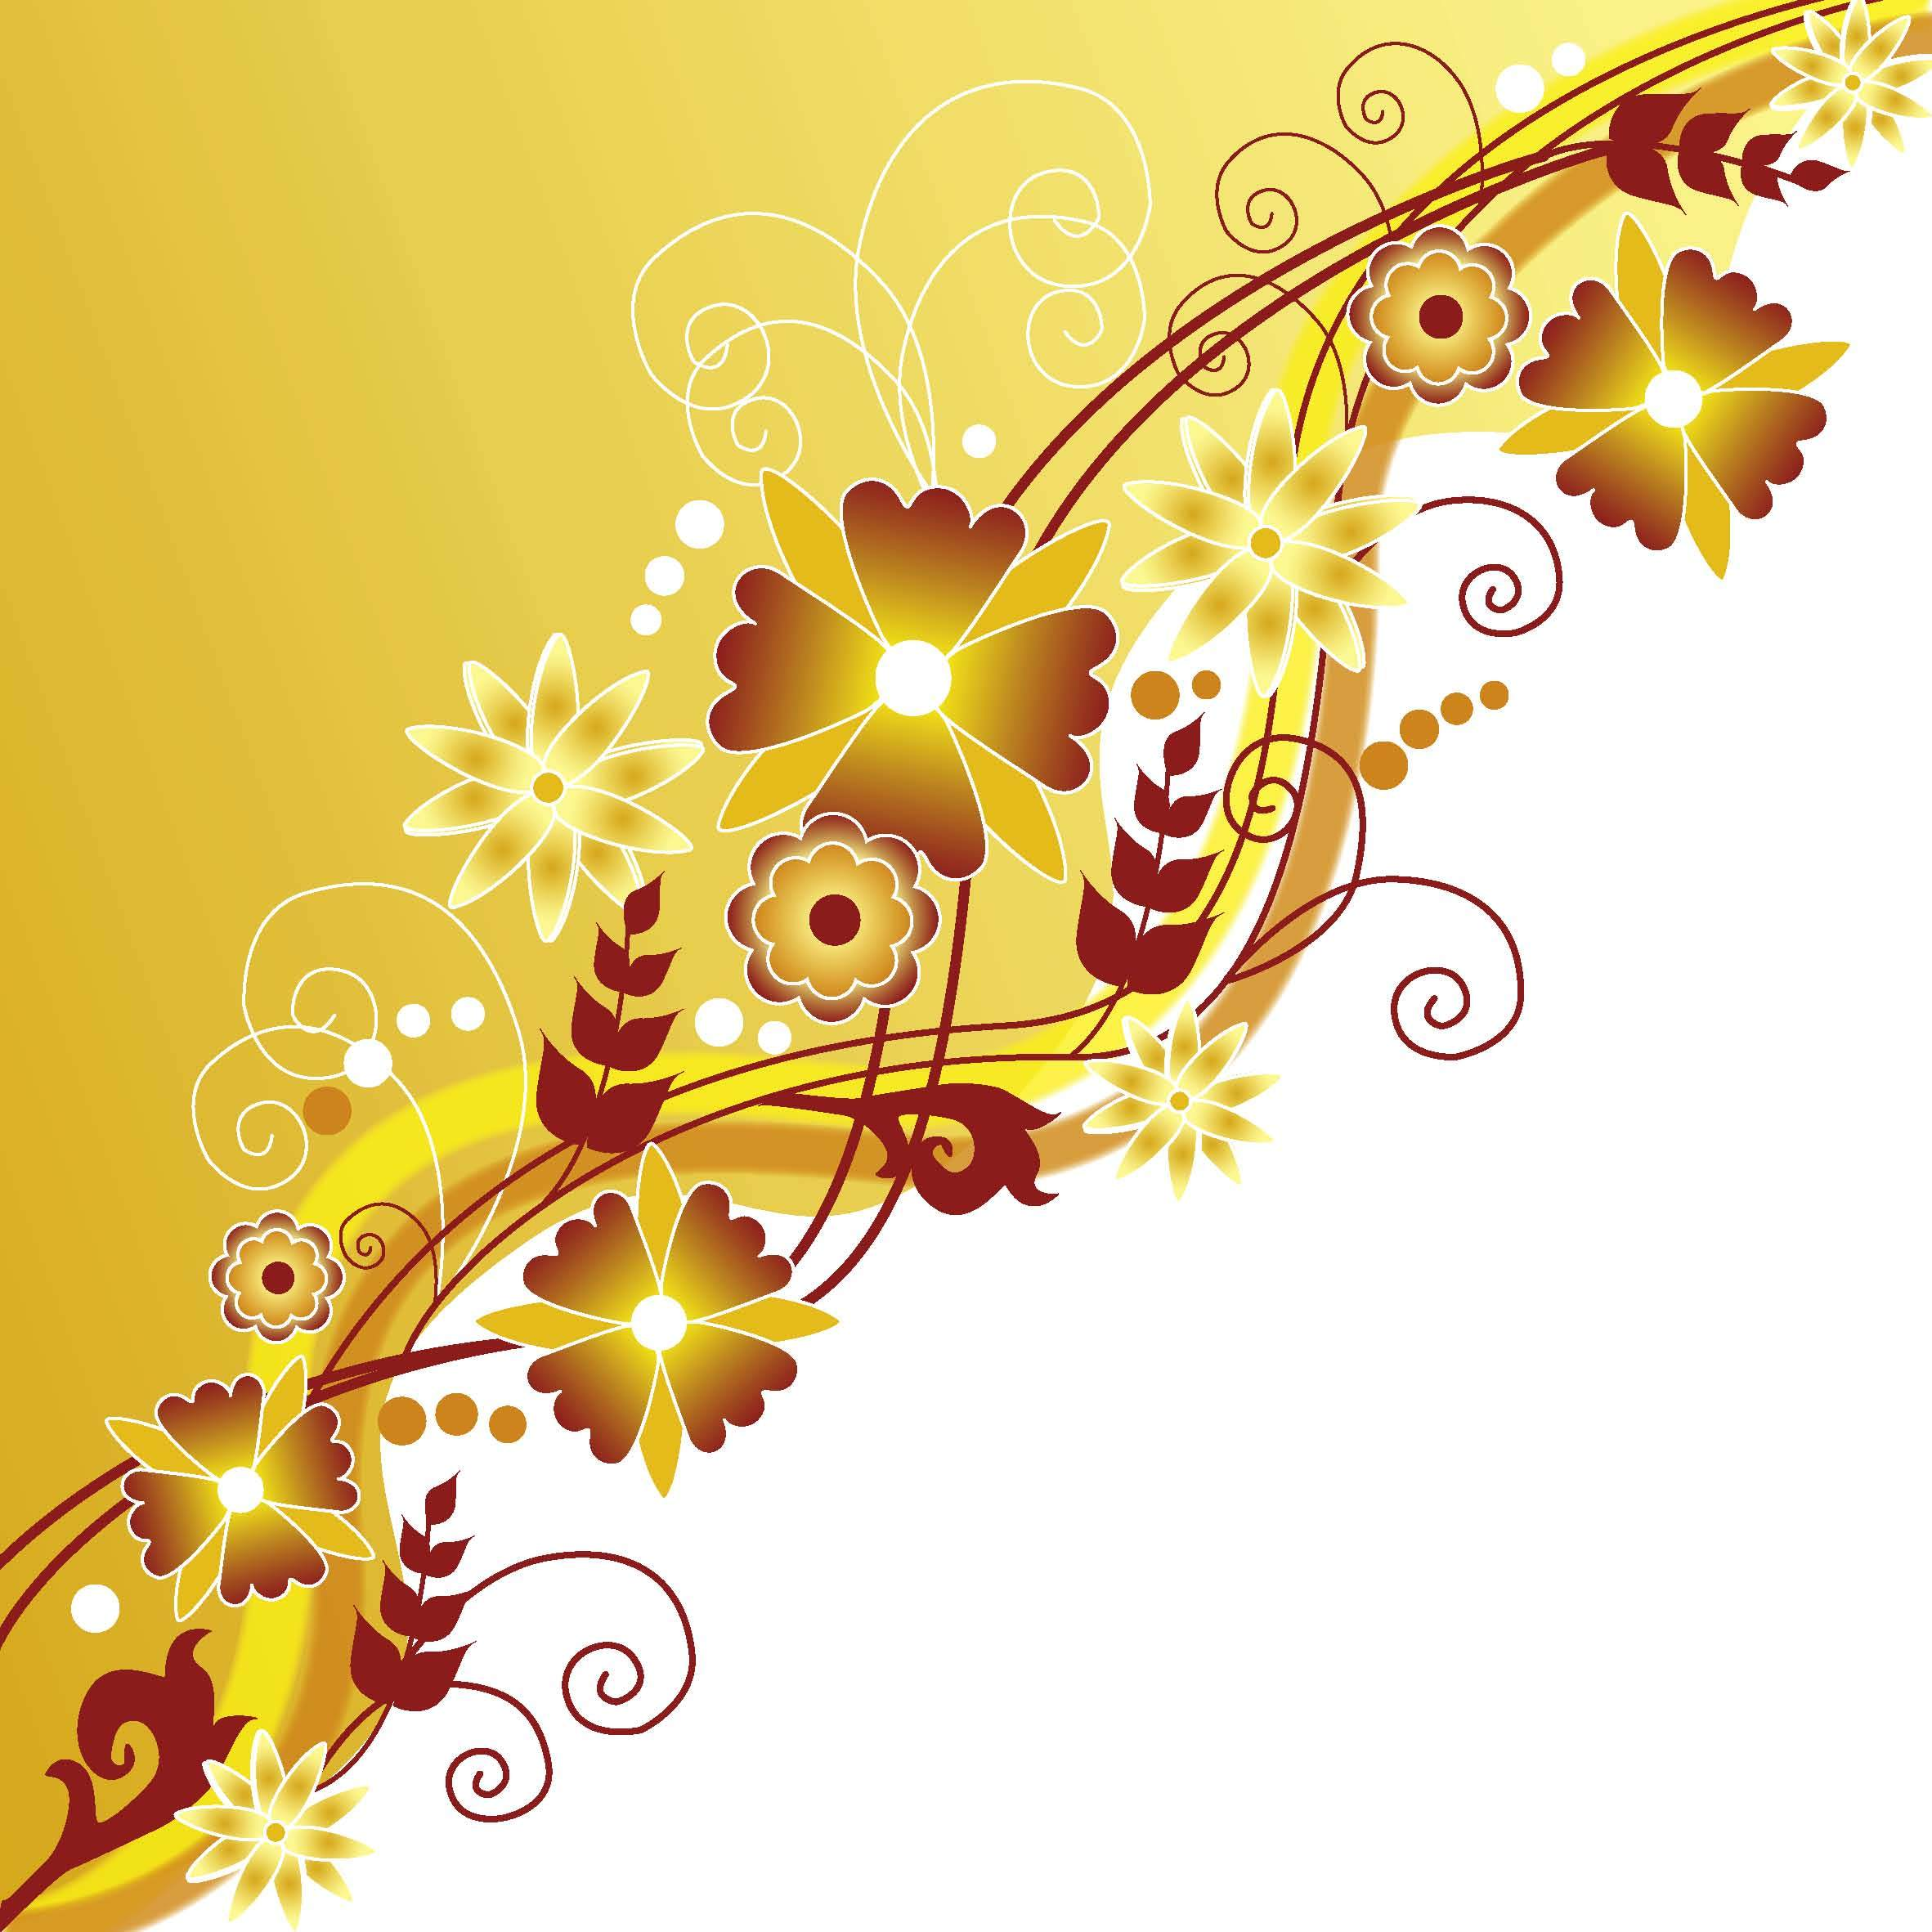 2363x2363 Flower Vector Art Clipart Best, Vector Art Graphic Design